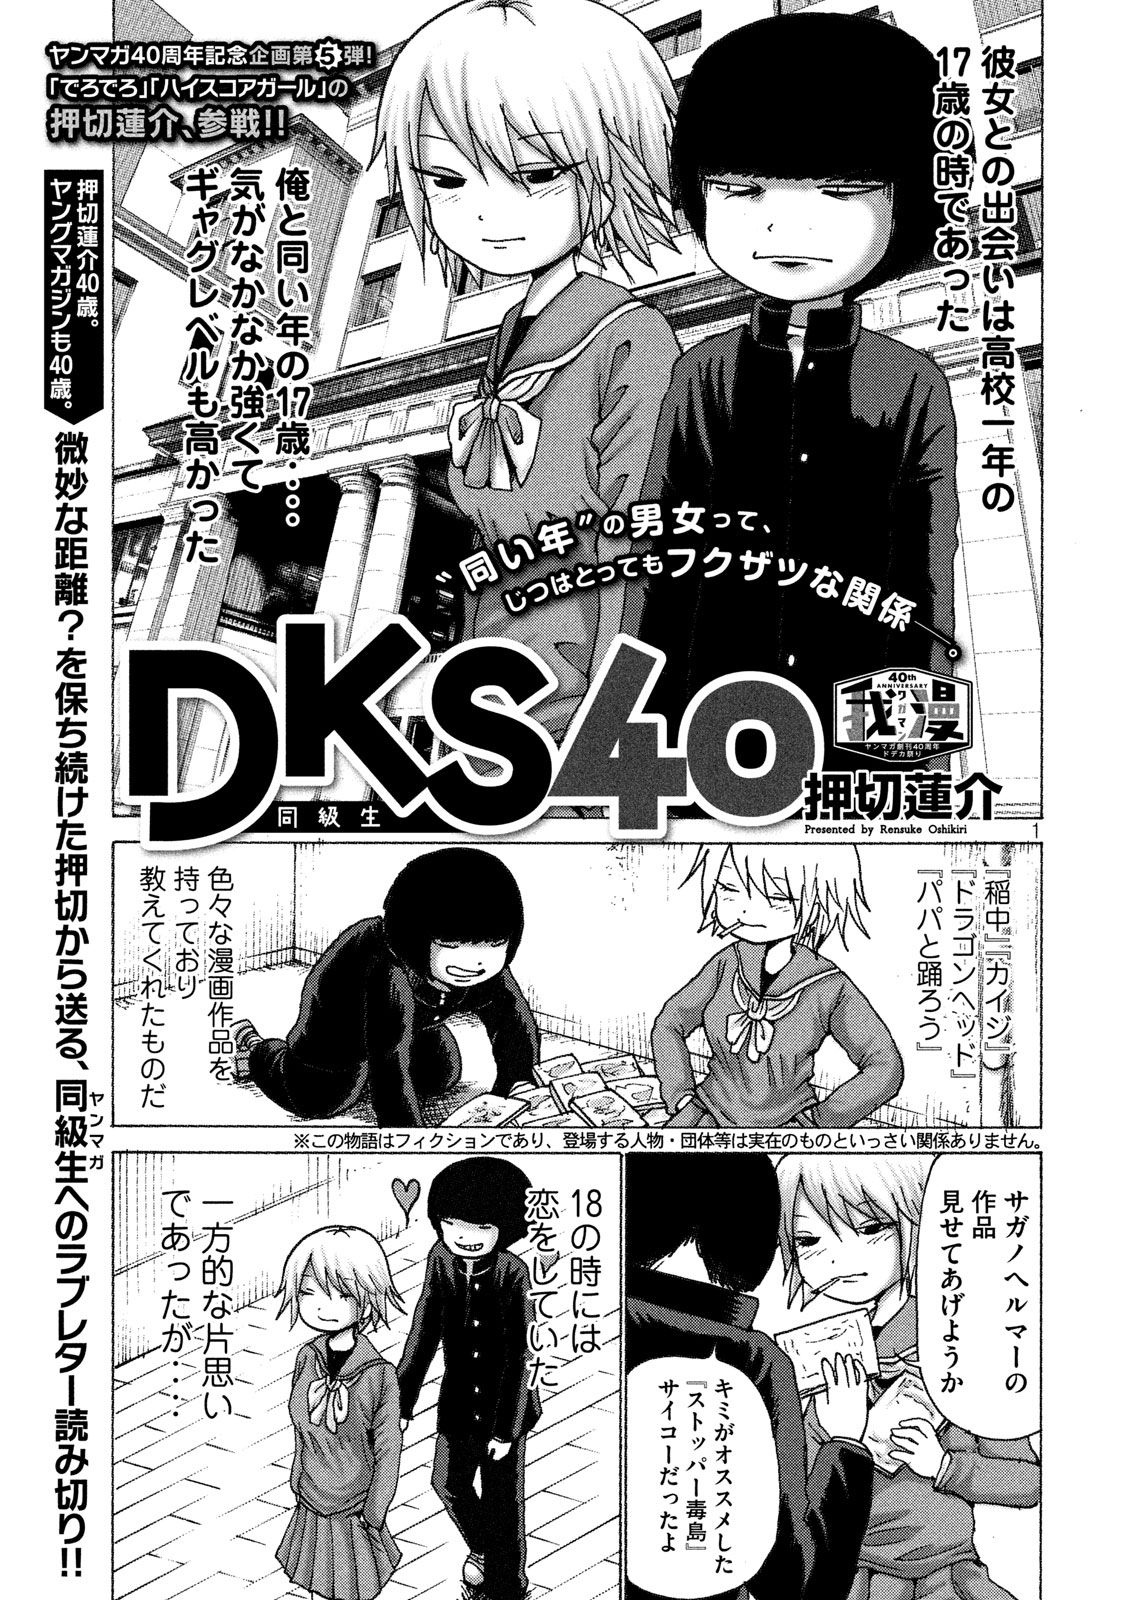 DKS40-page.jpg